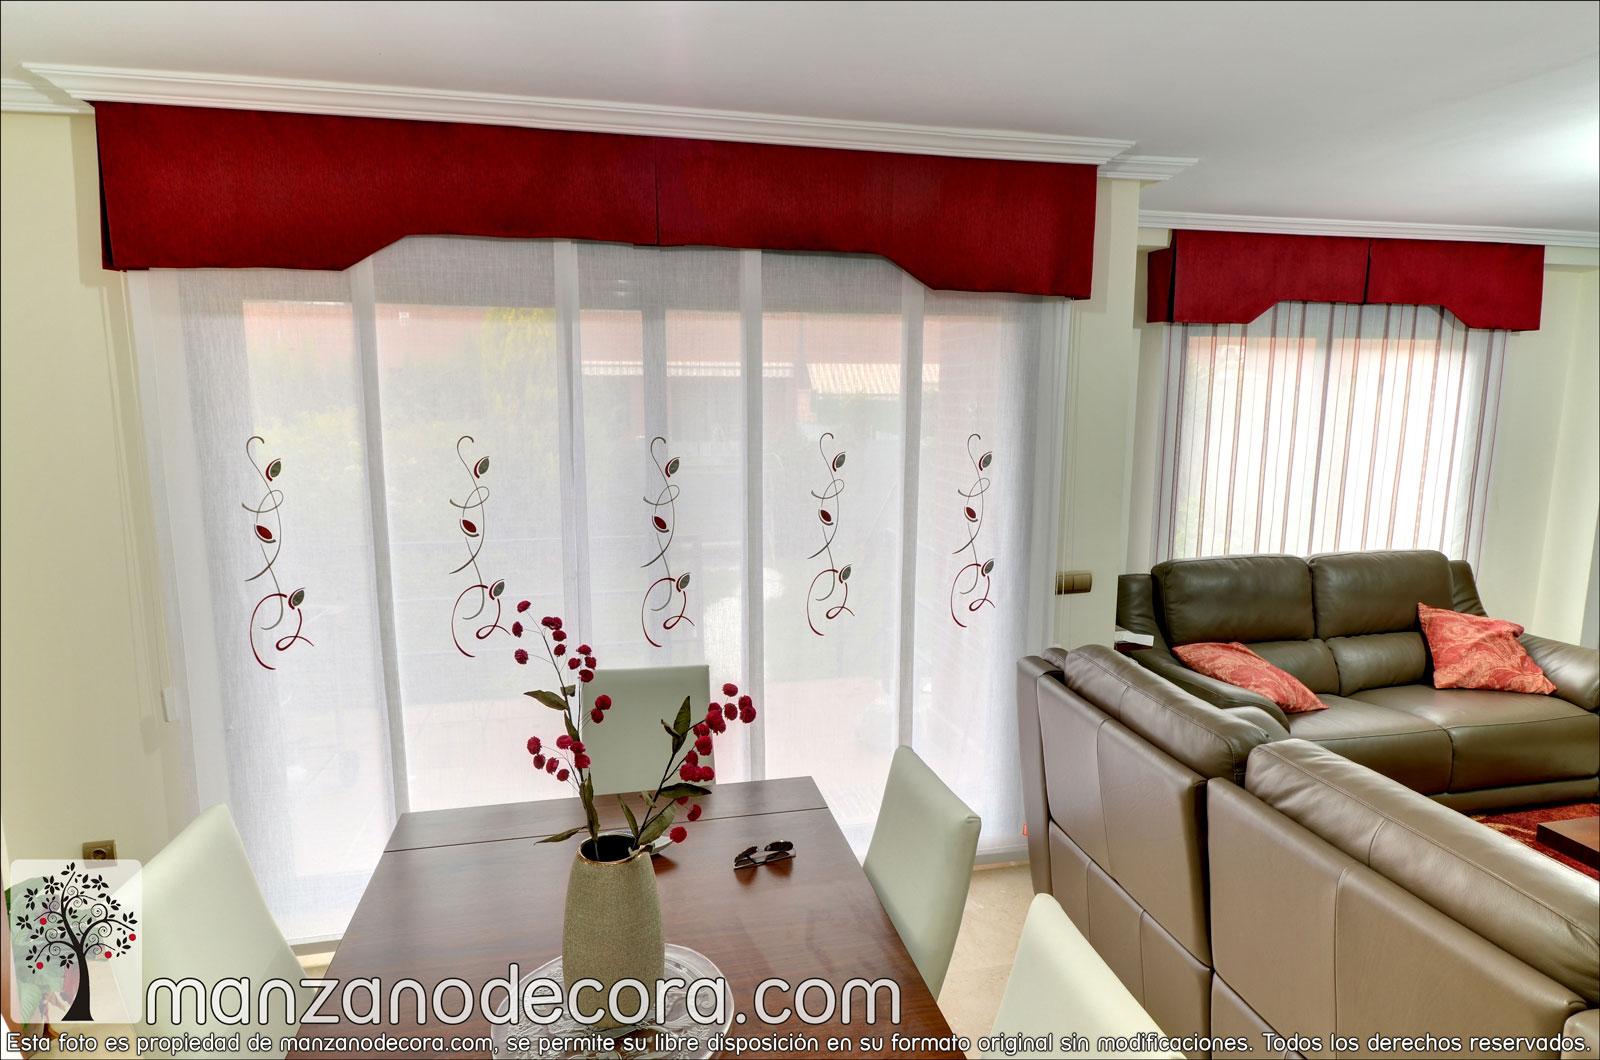 Paneles japoneses cortinas manzanodecora - Cortinas de paneles japoneses ...